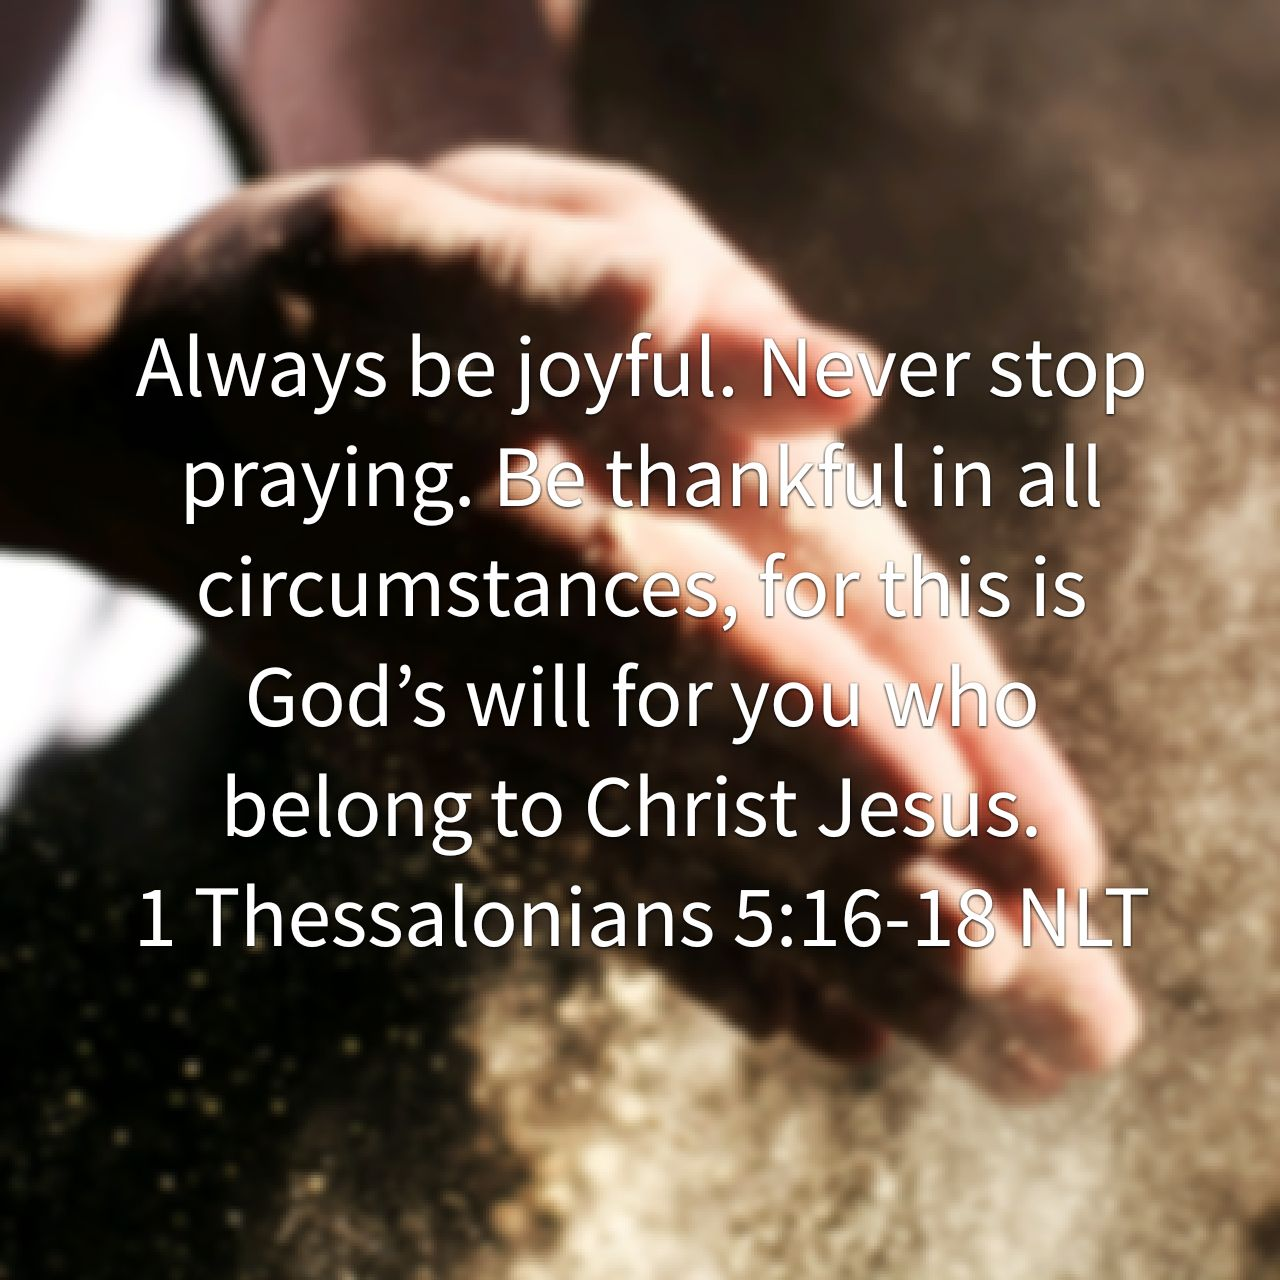 Thessalonians 5:16-18 NLT